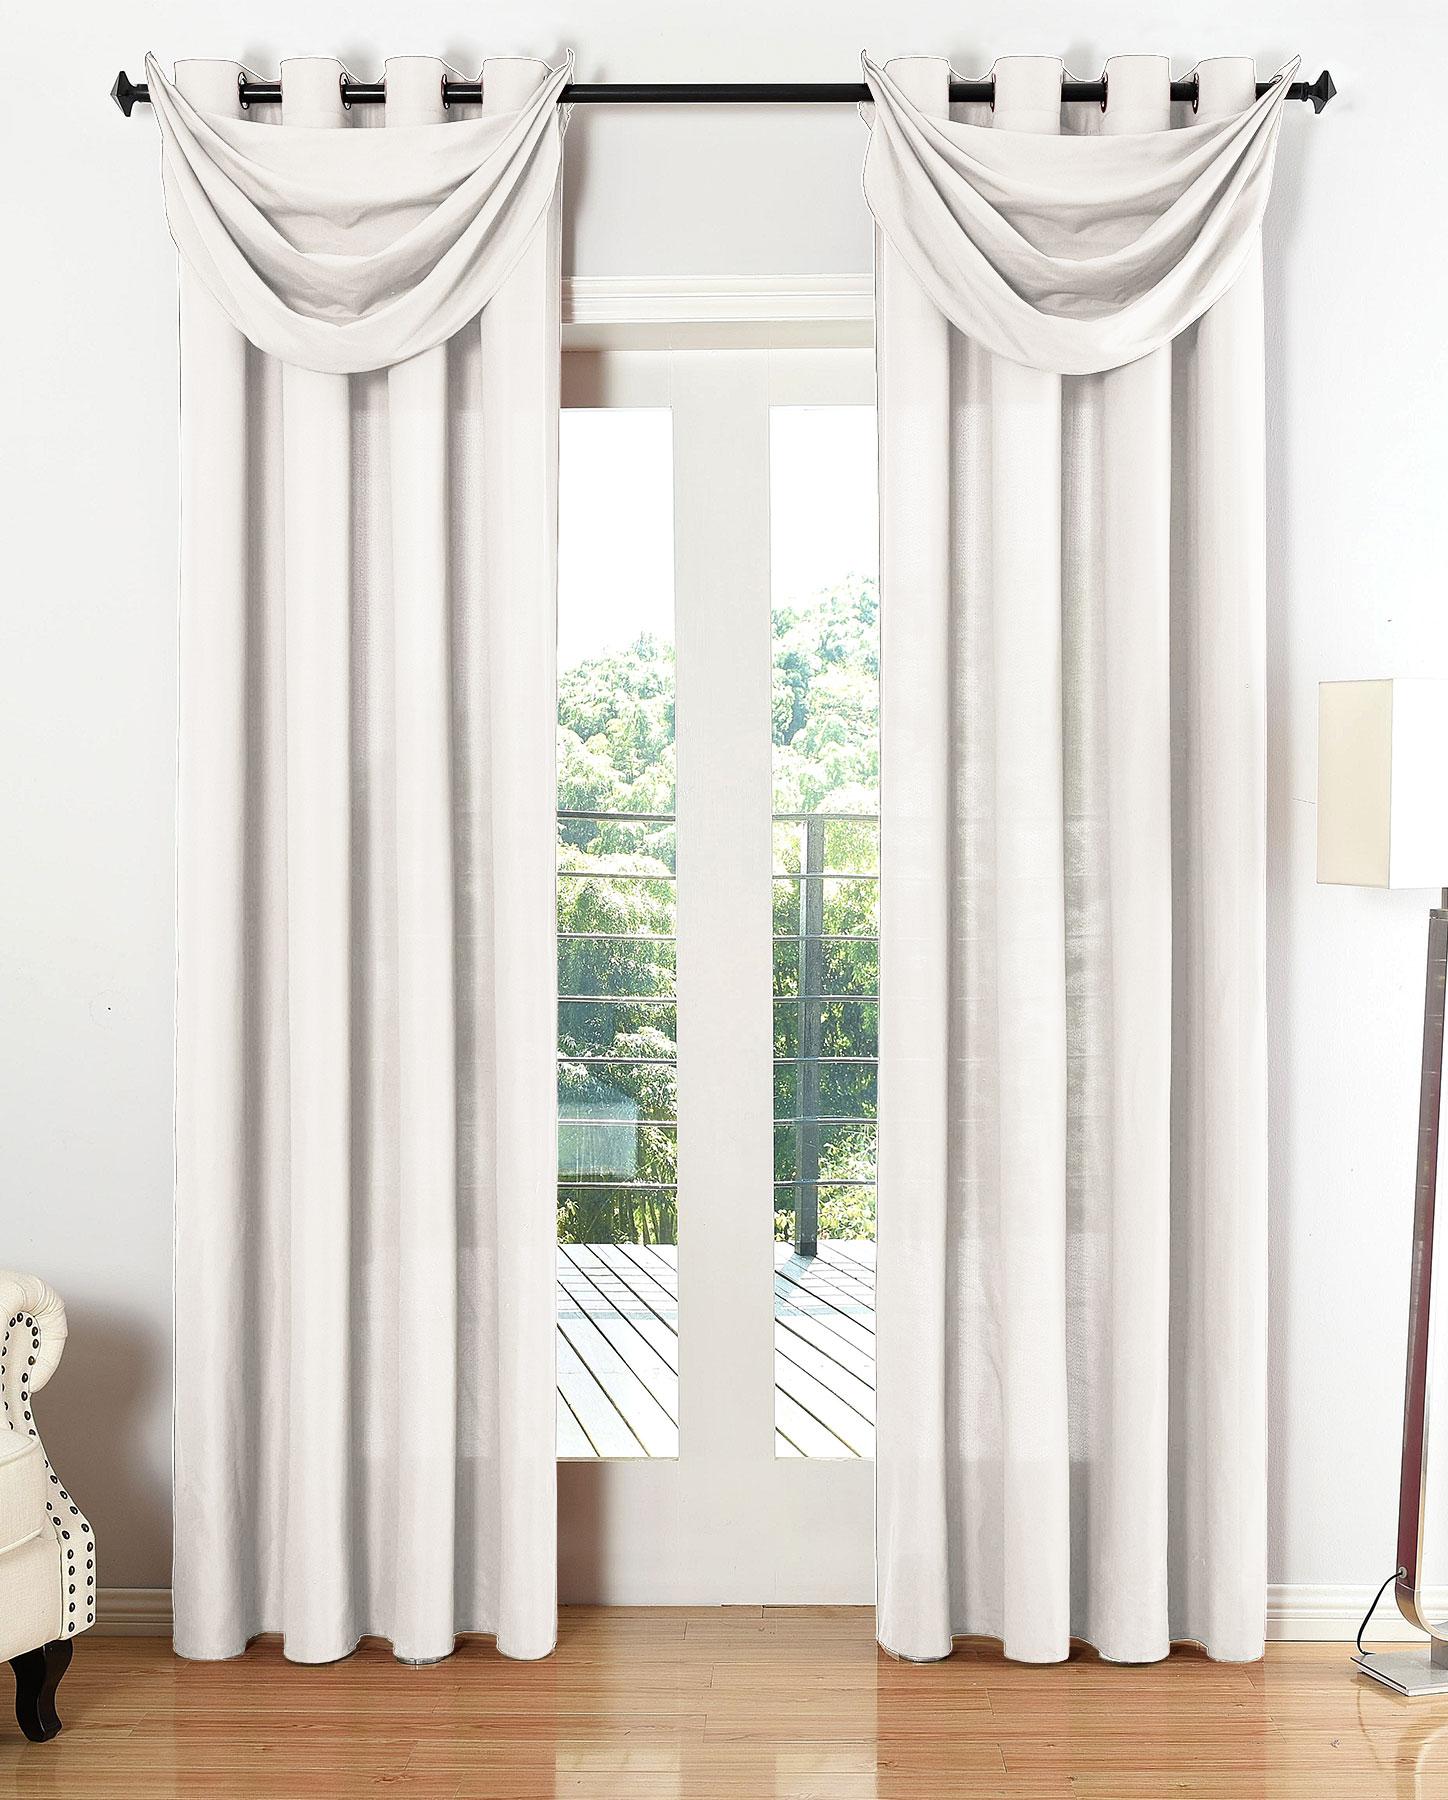 vorhang set blickdicht schal sen microsatin segeltuch hxb 225x140 cm creme ebay. Black Bedroom Furniture Sets. Home Design Ideas